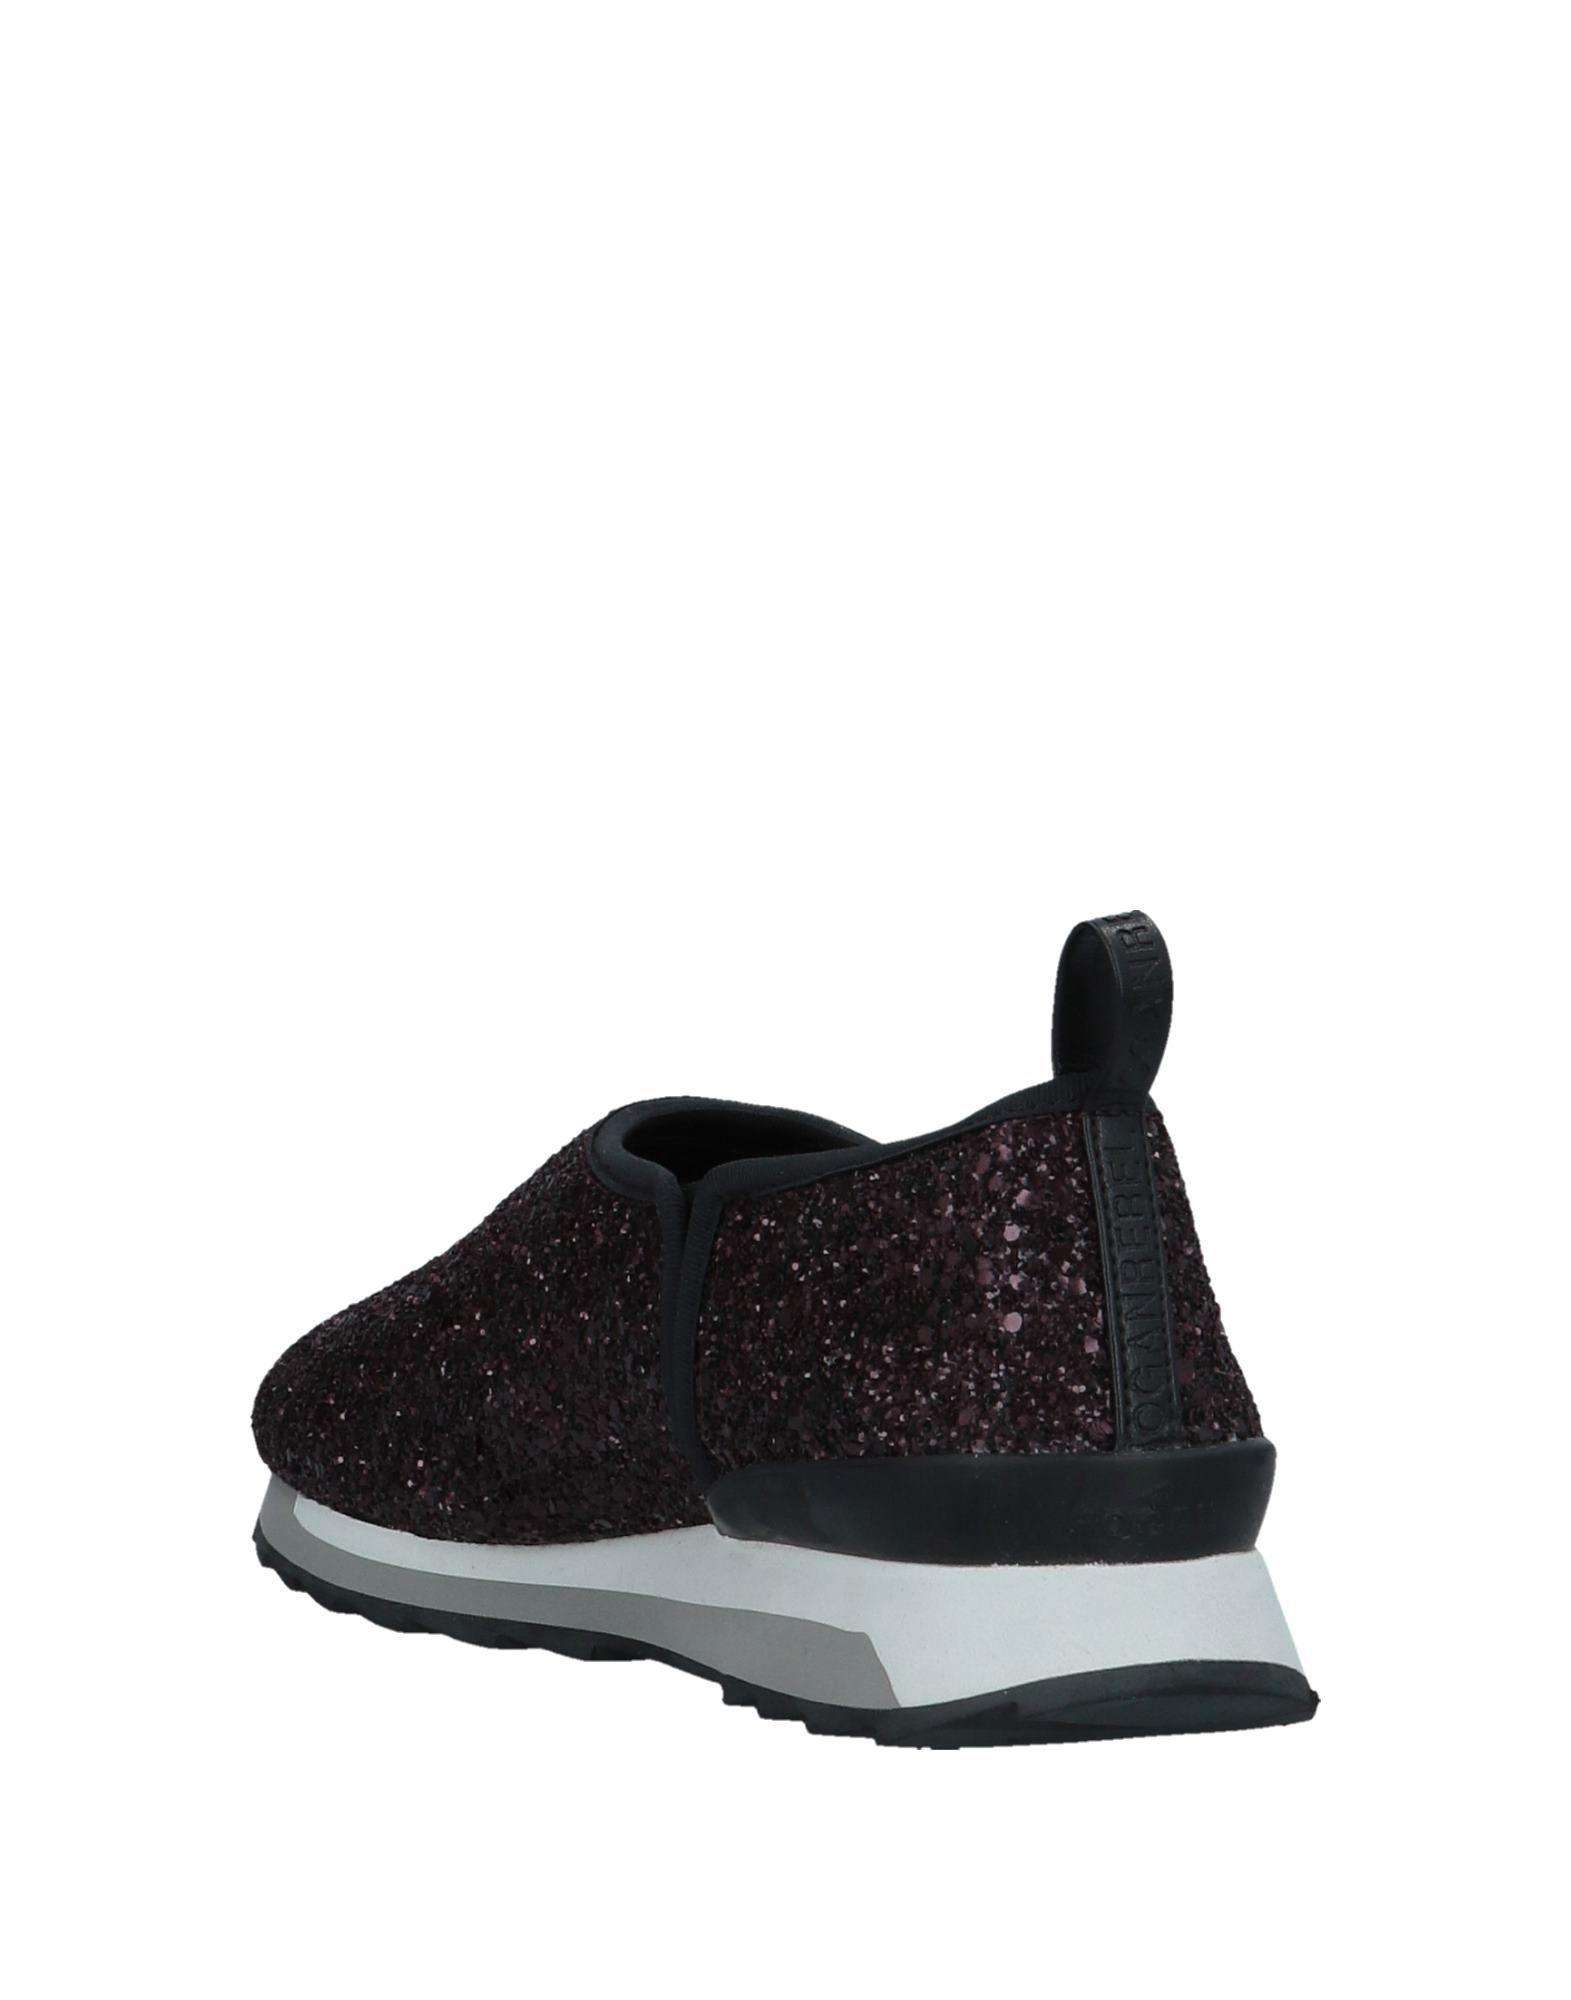 Hogan Rebel Deep Purple Glitter Sneakers